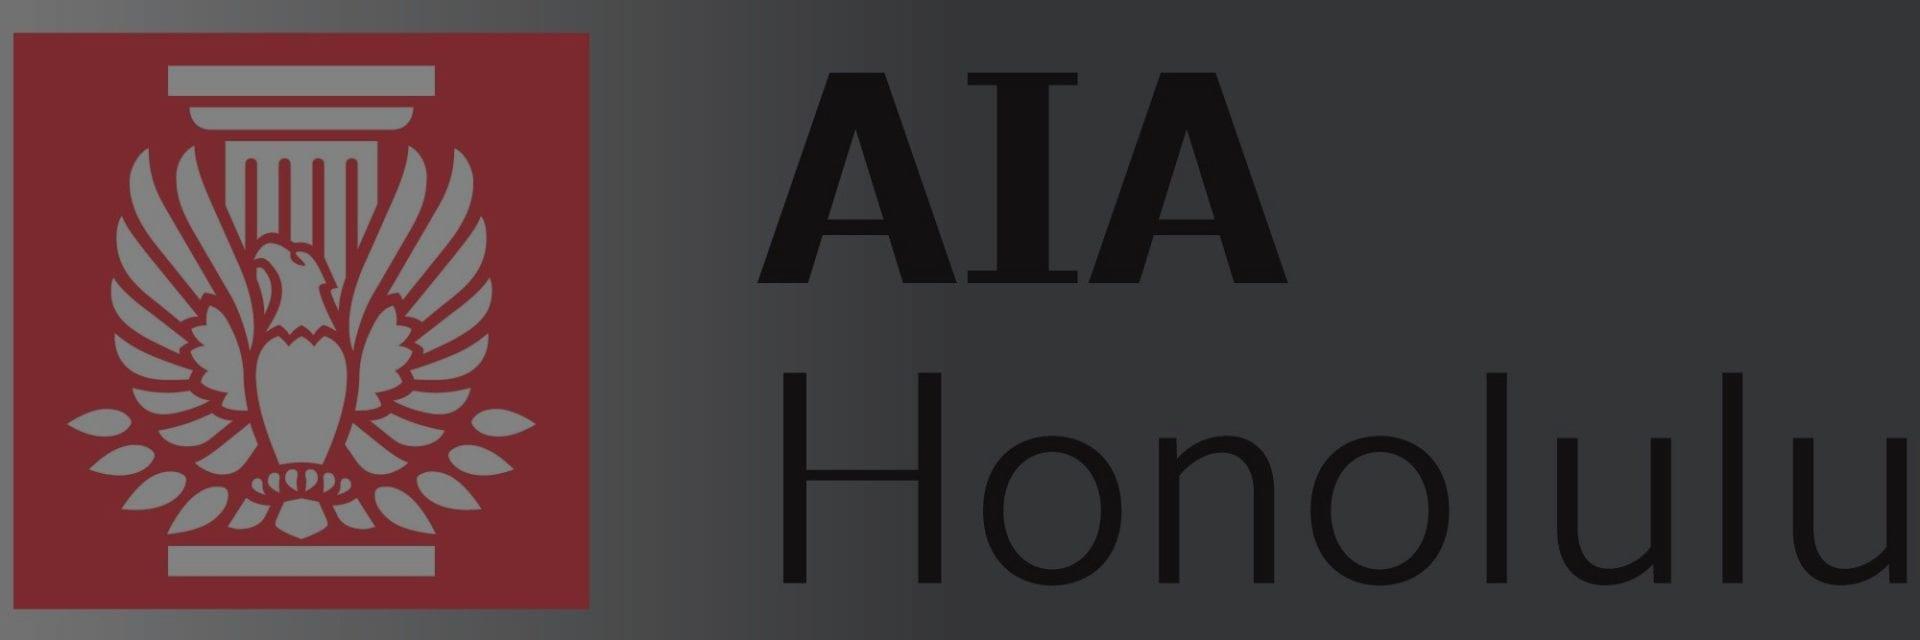 AIA Honolulu - Hawaii's Economy Meets COVID-19